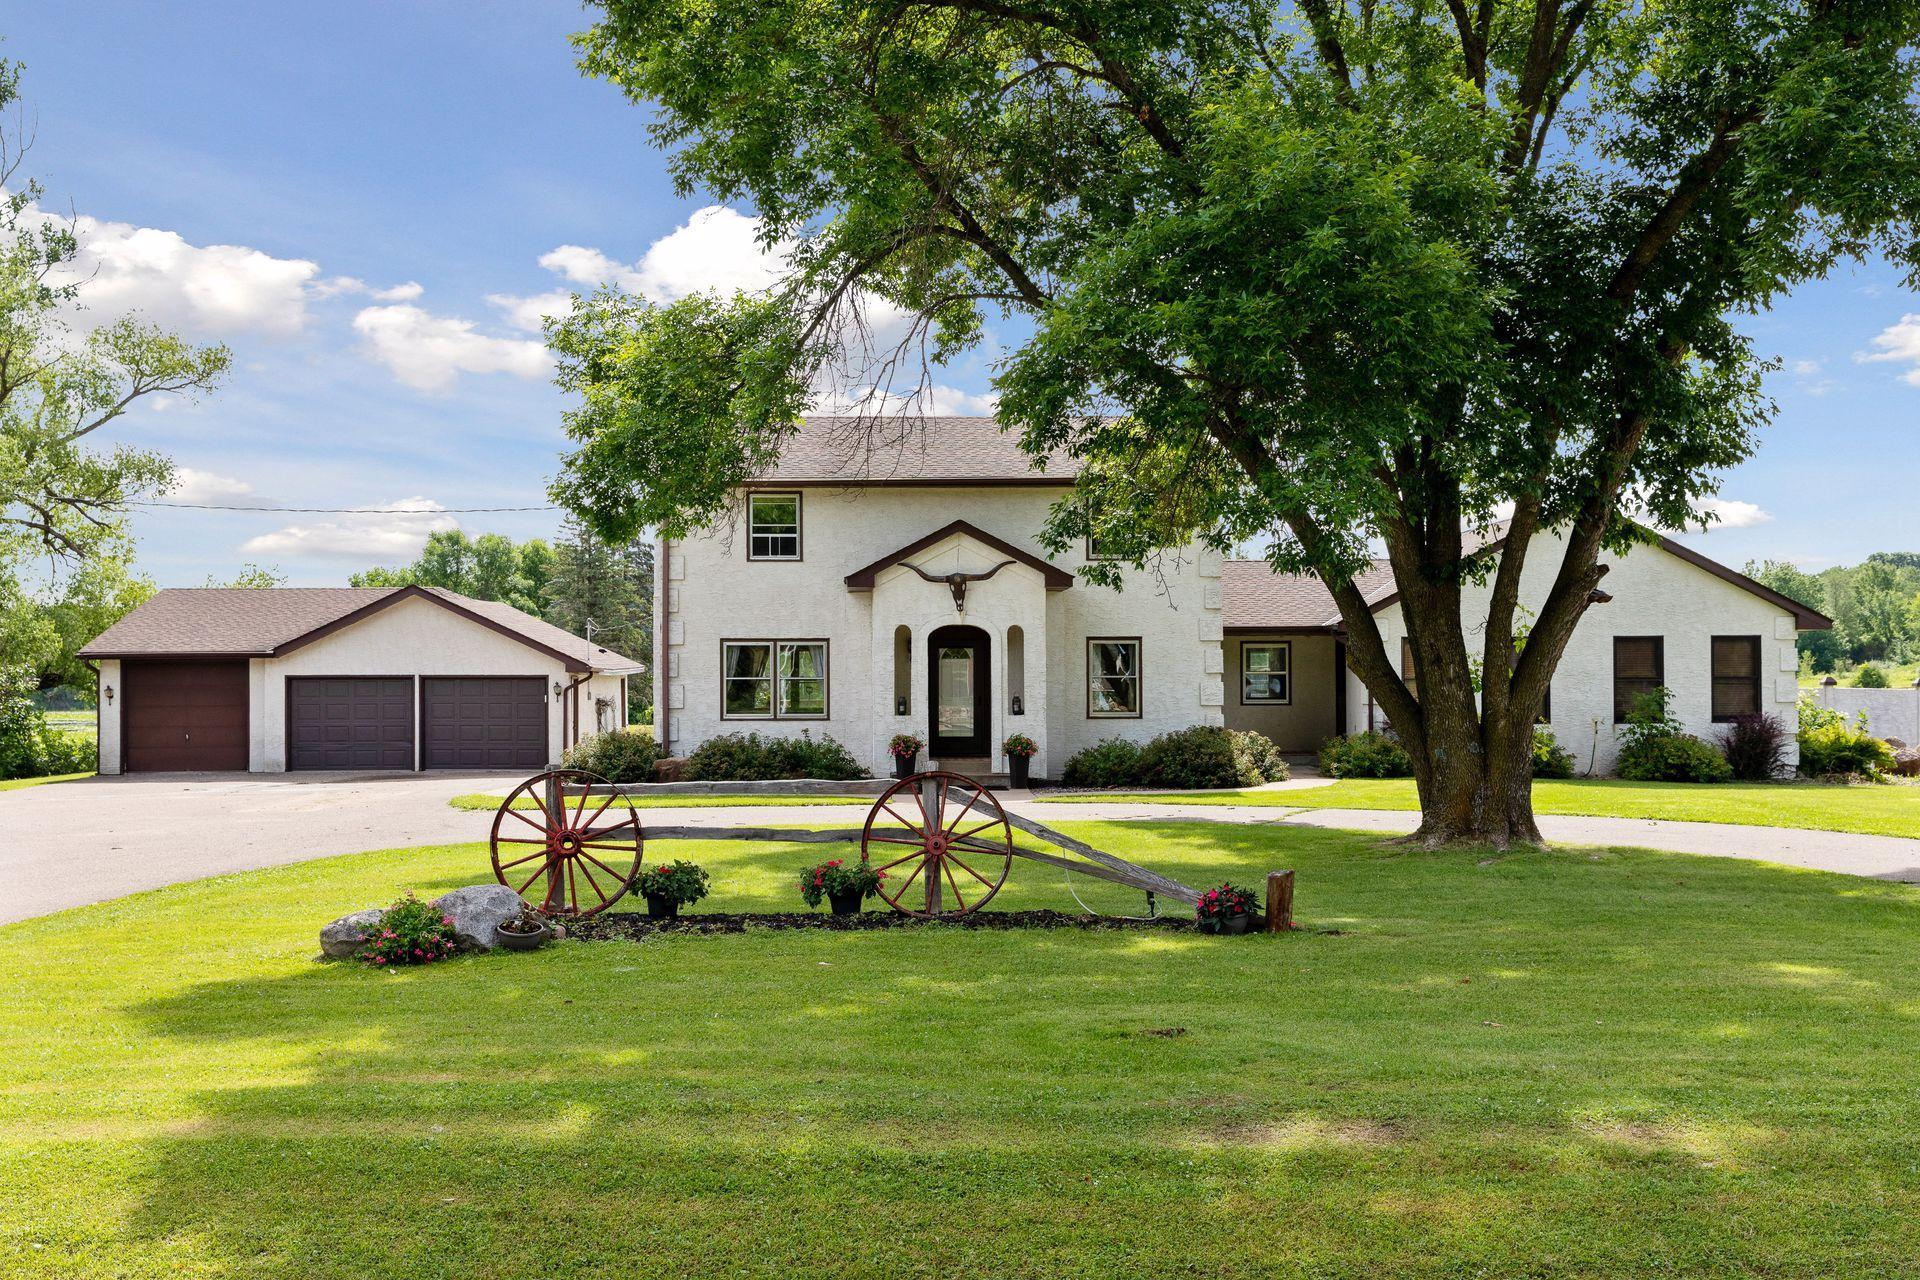 22695 Olinda Trail N Property Photo - Scandia, MN real estate listing